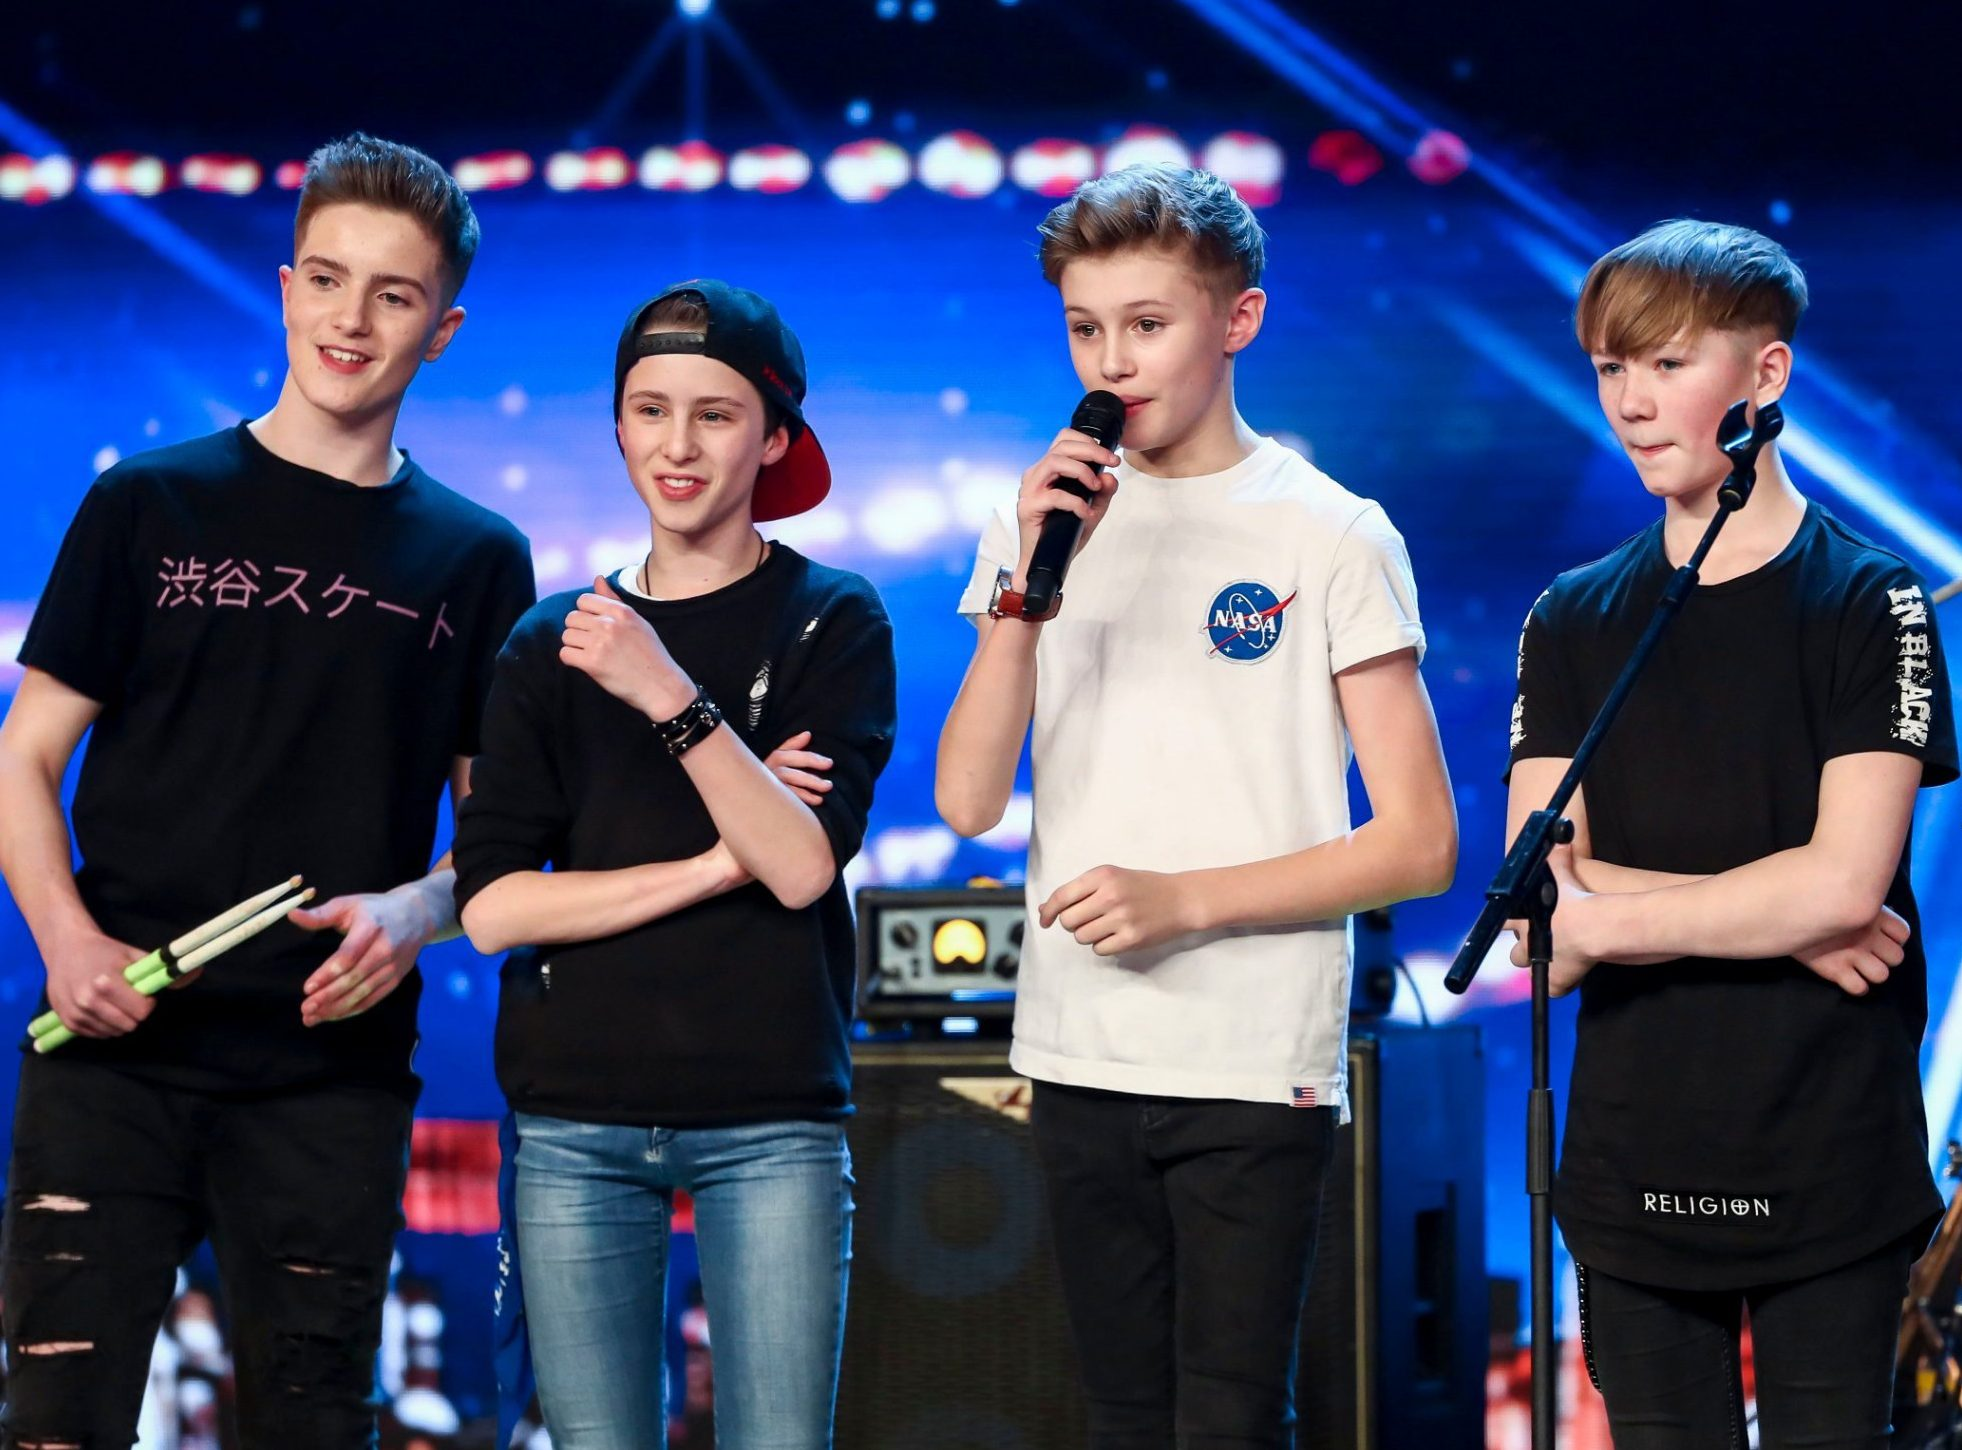 Britain's Got Talent viewers brand show 'a farce' as West End performers Chapter 13 land golden buzzer